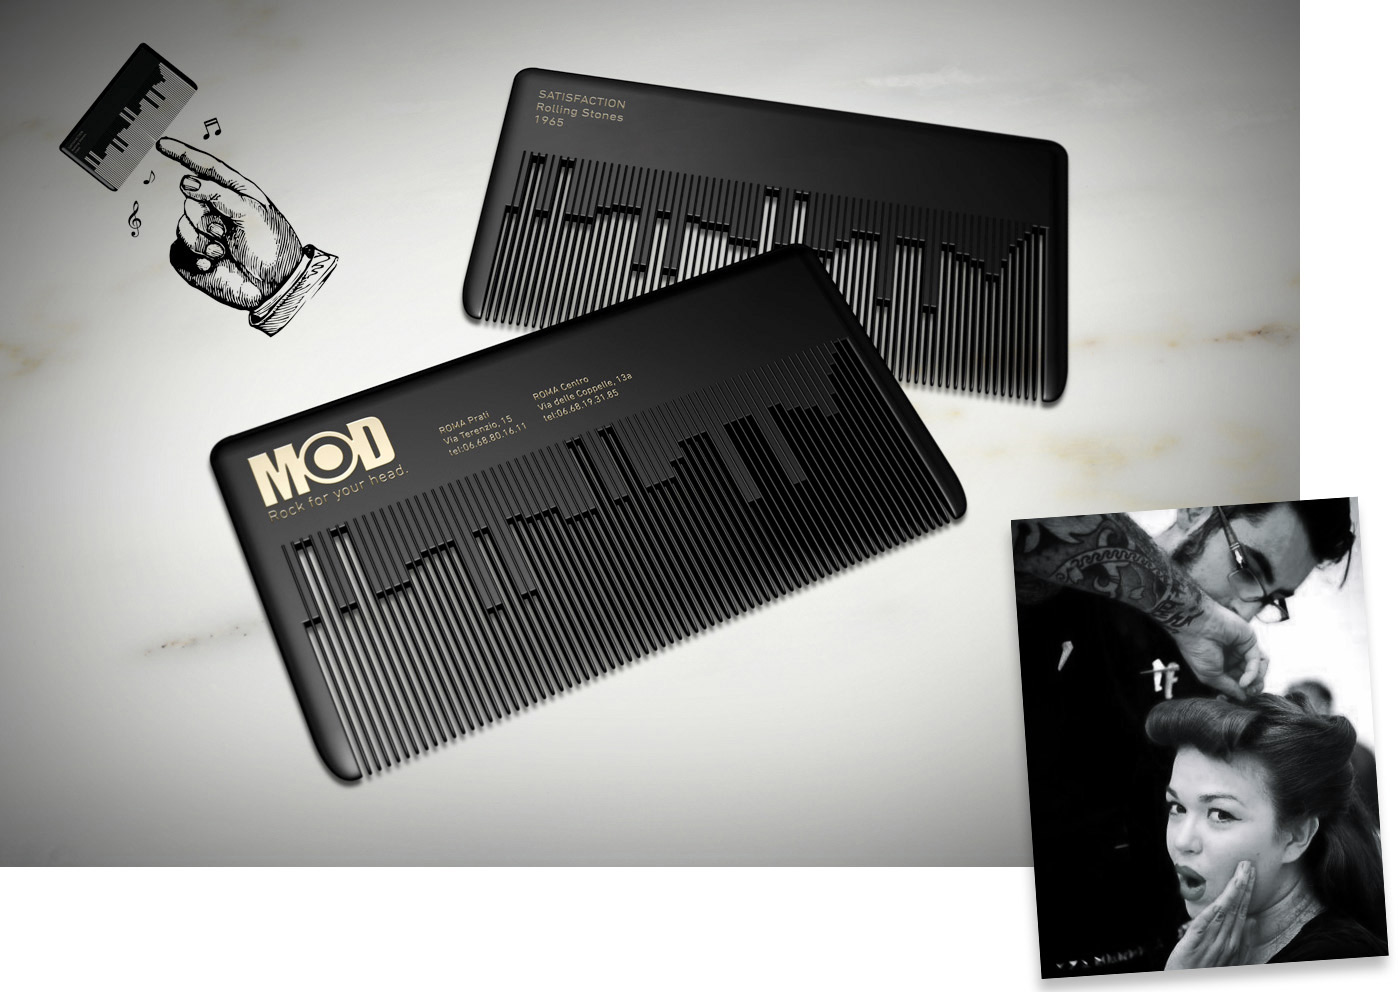 Direct advert by fabio milito musical comb businesscard ads of musical comb businesscard colourmoves